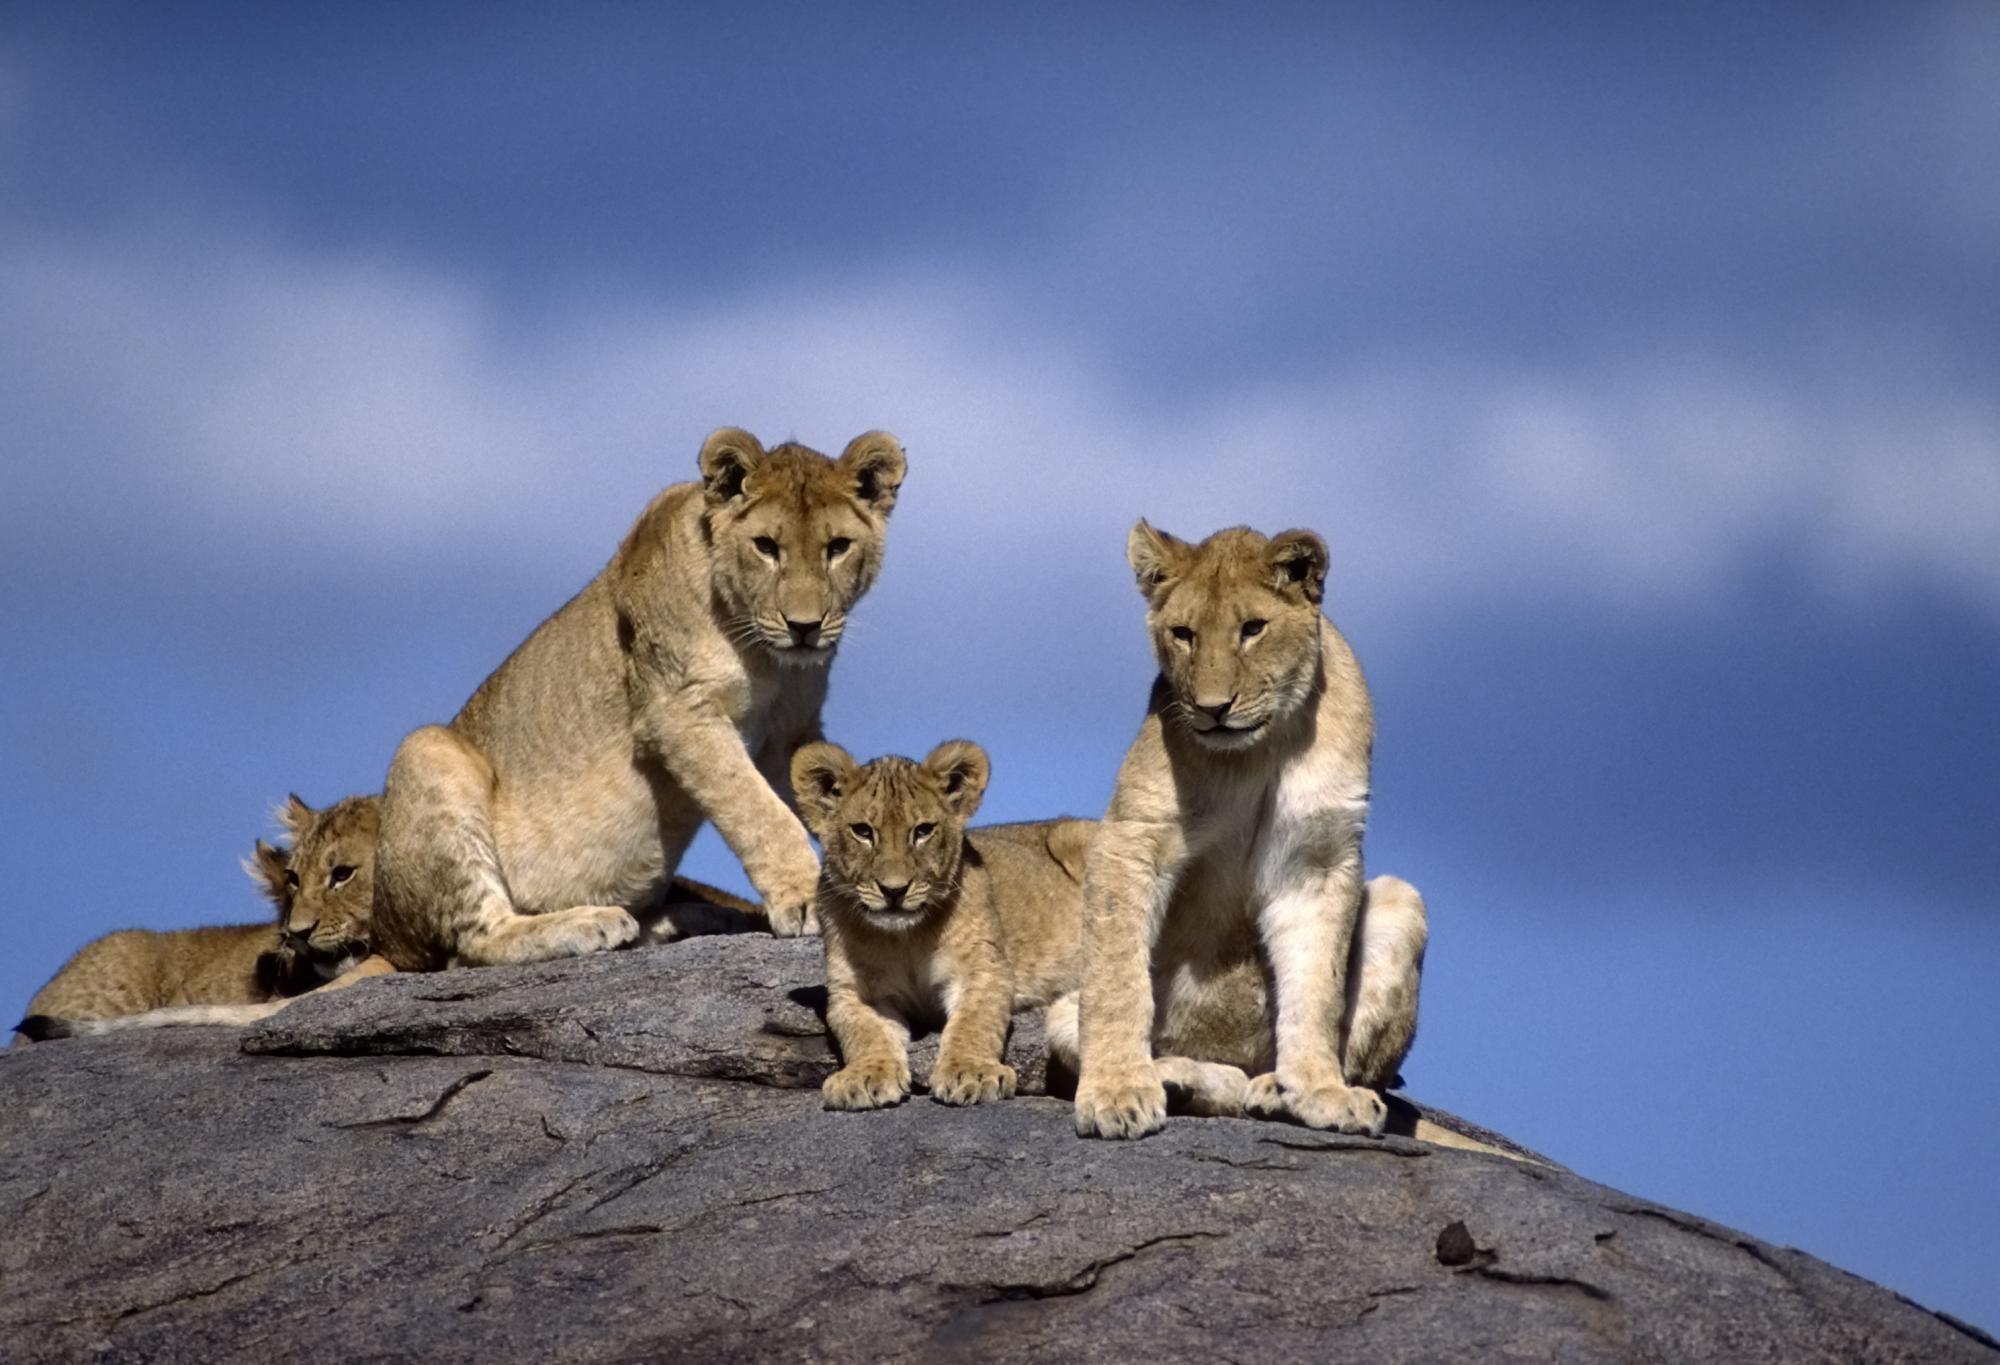 1 Night / 2Days Amboseli National Park Safari from Nairobi